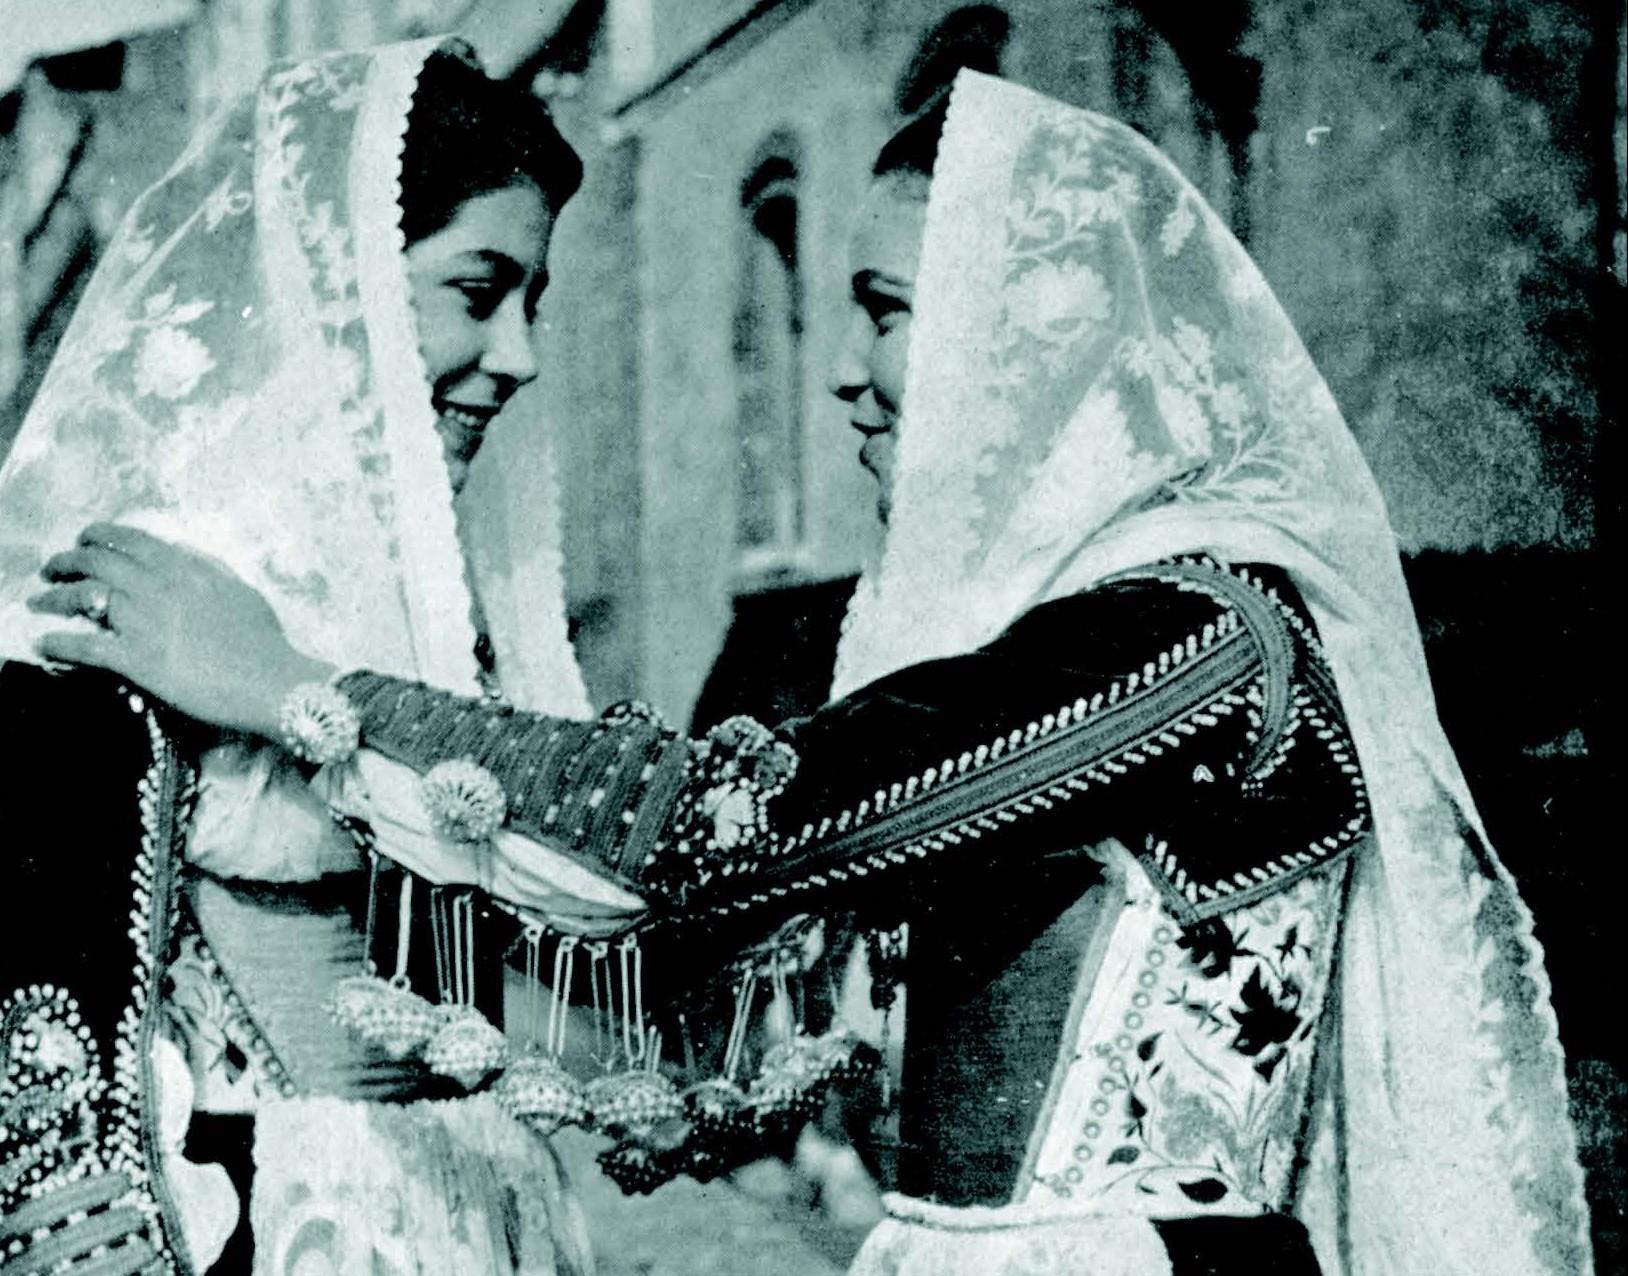 Ragazze in costume. 1958